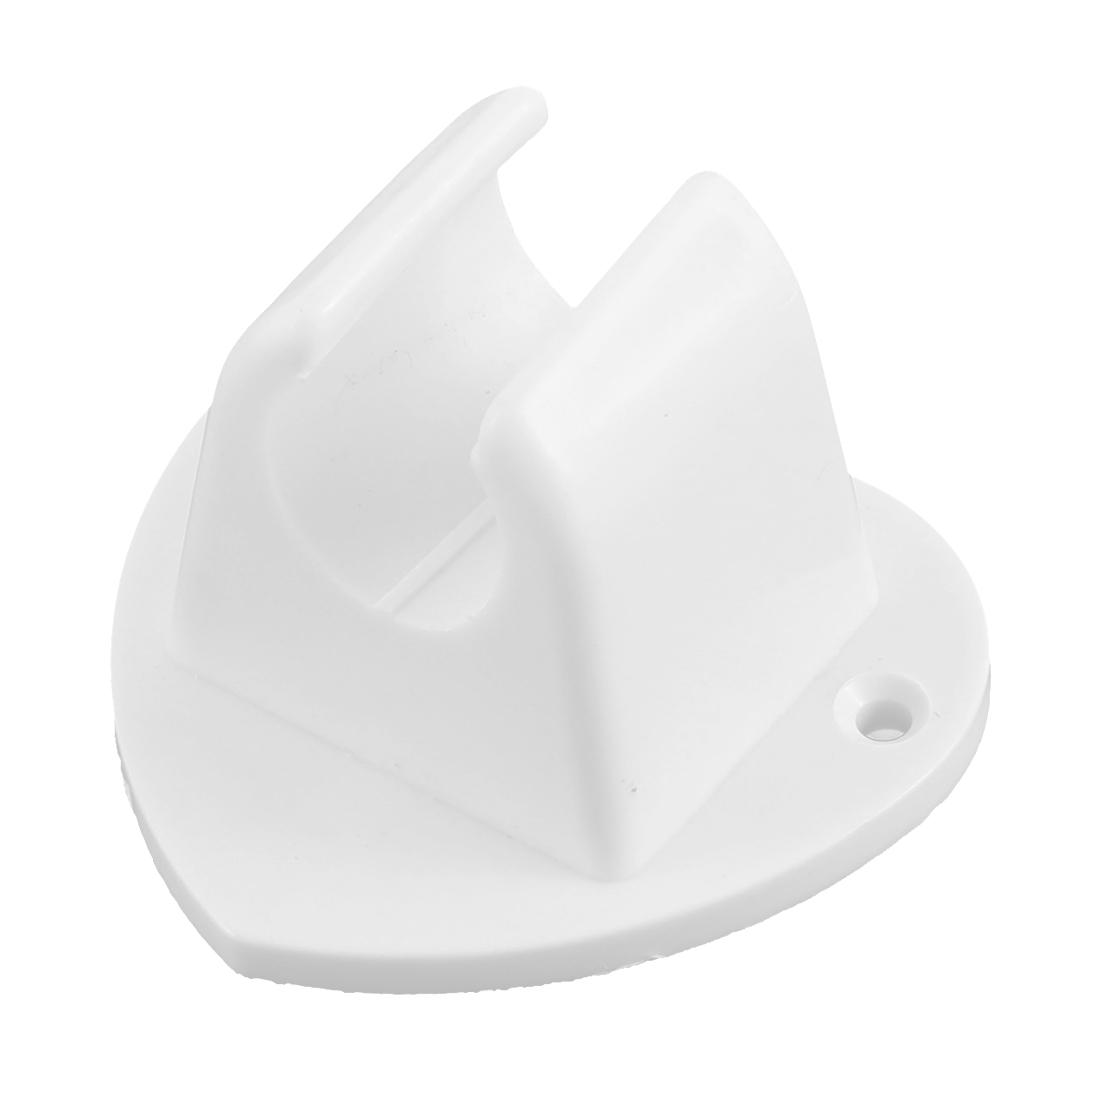 Bathroom Shower Head Wall Mounted Heart Shape Bracket Holder White